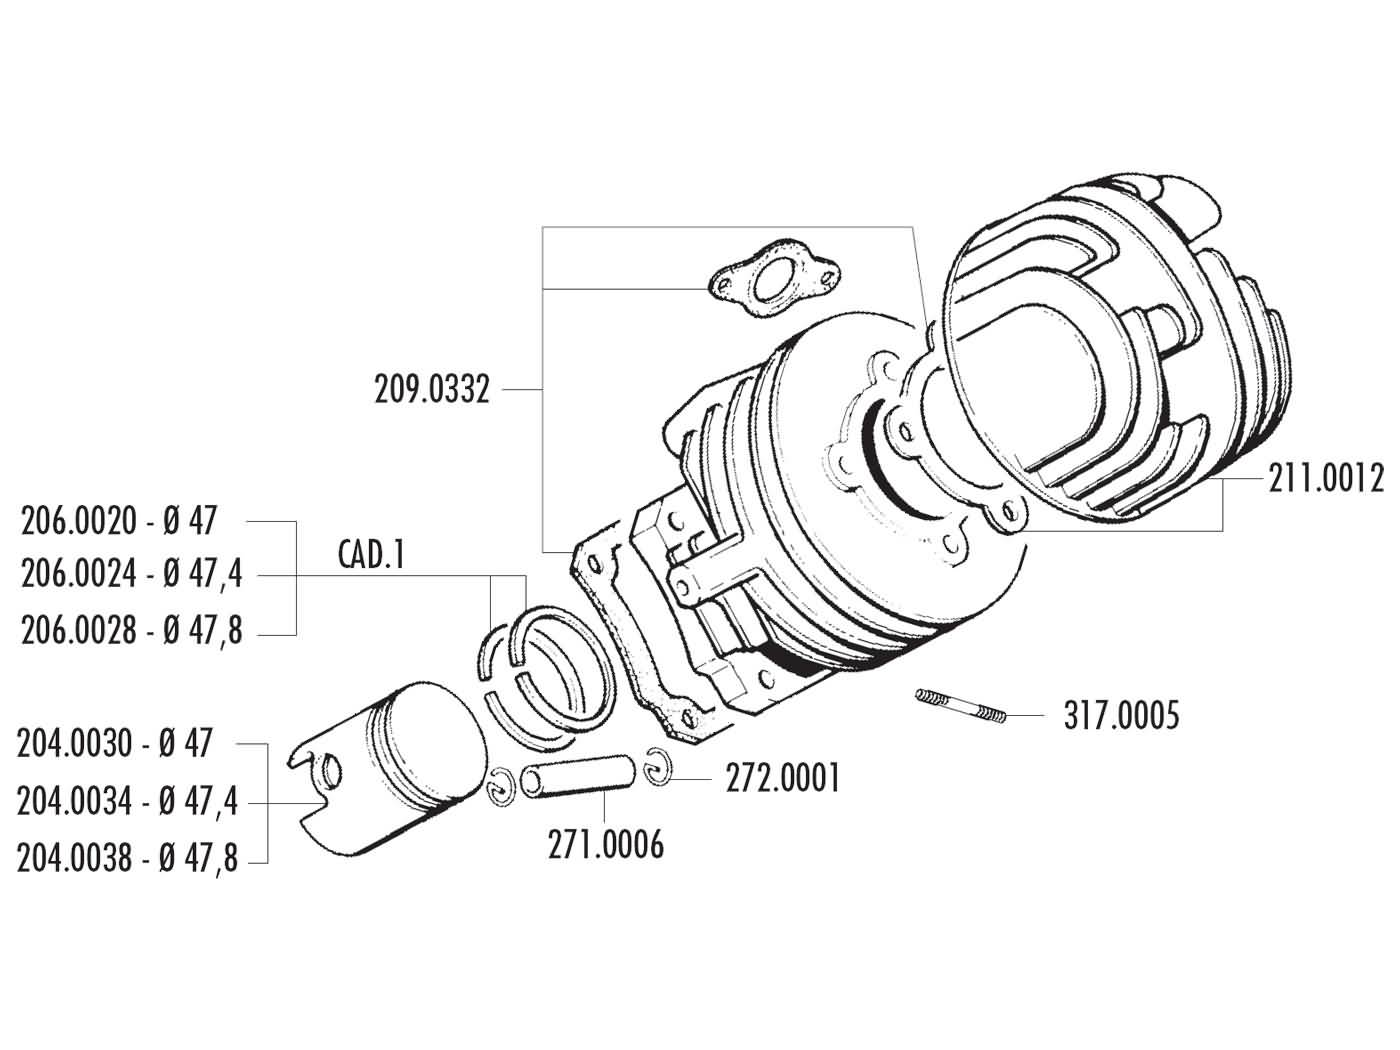 Zylinderkit Polini Grauguss Racing 75ccm 47mm für Ape 50